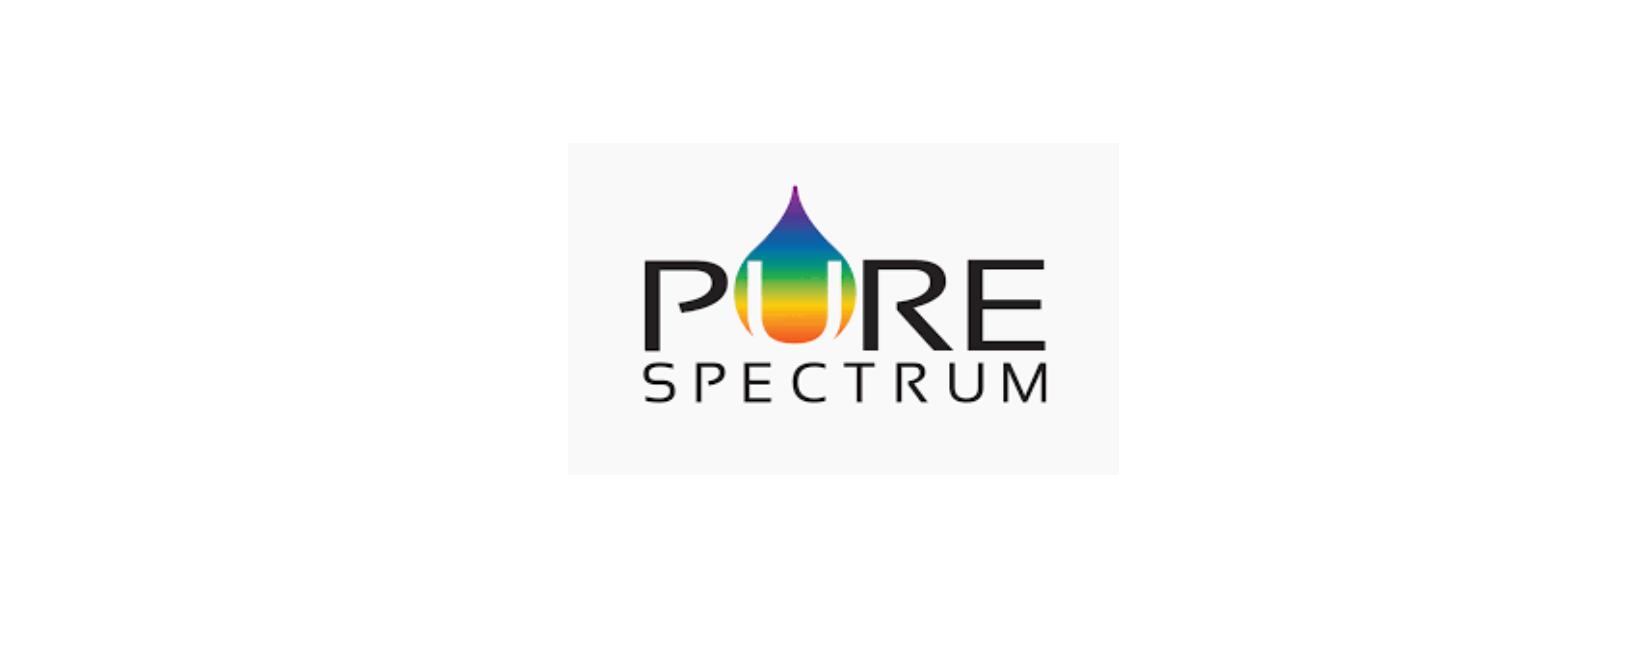 Pure Spectrum Discount Code 2021